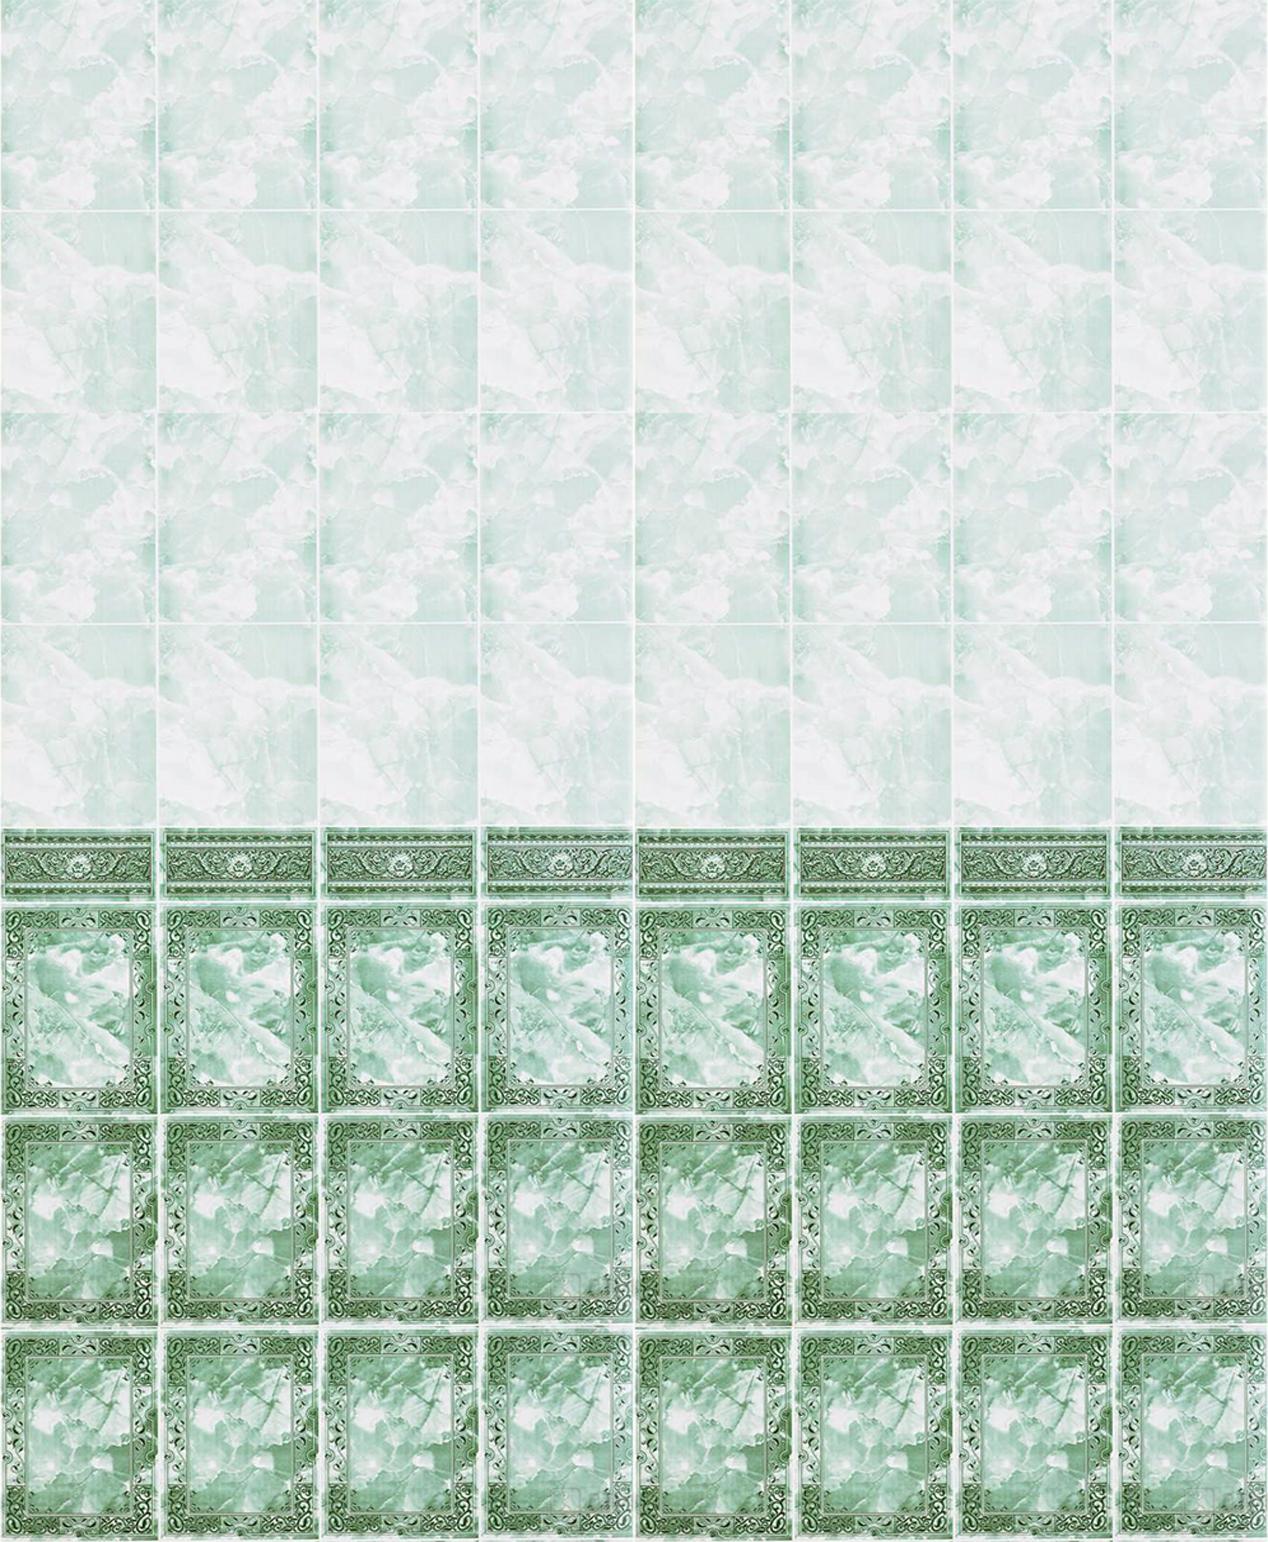 Панель с фризом «Барон зелёный» 0,25х2,7 м.